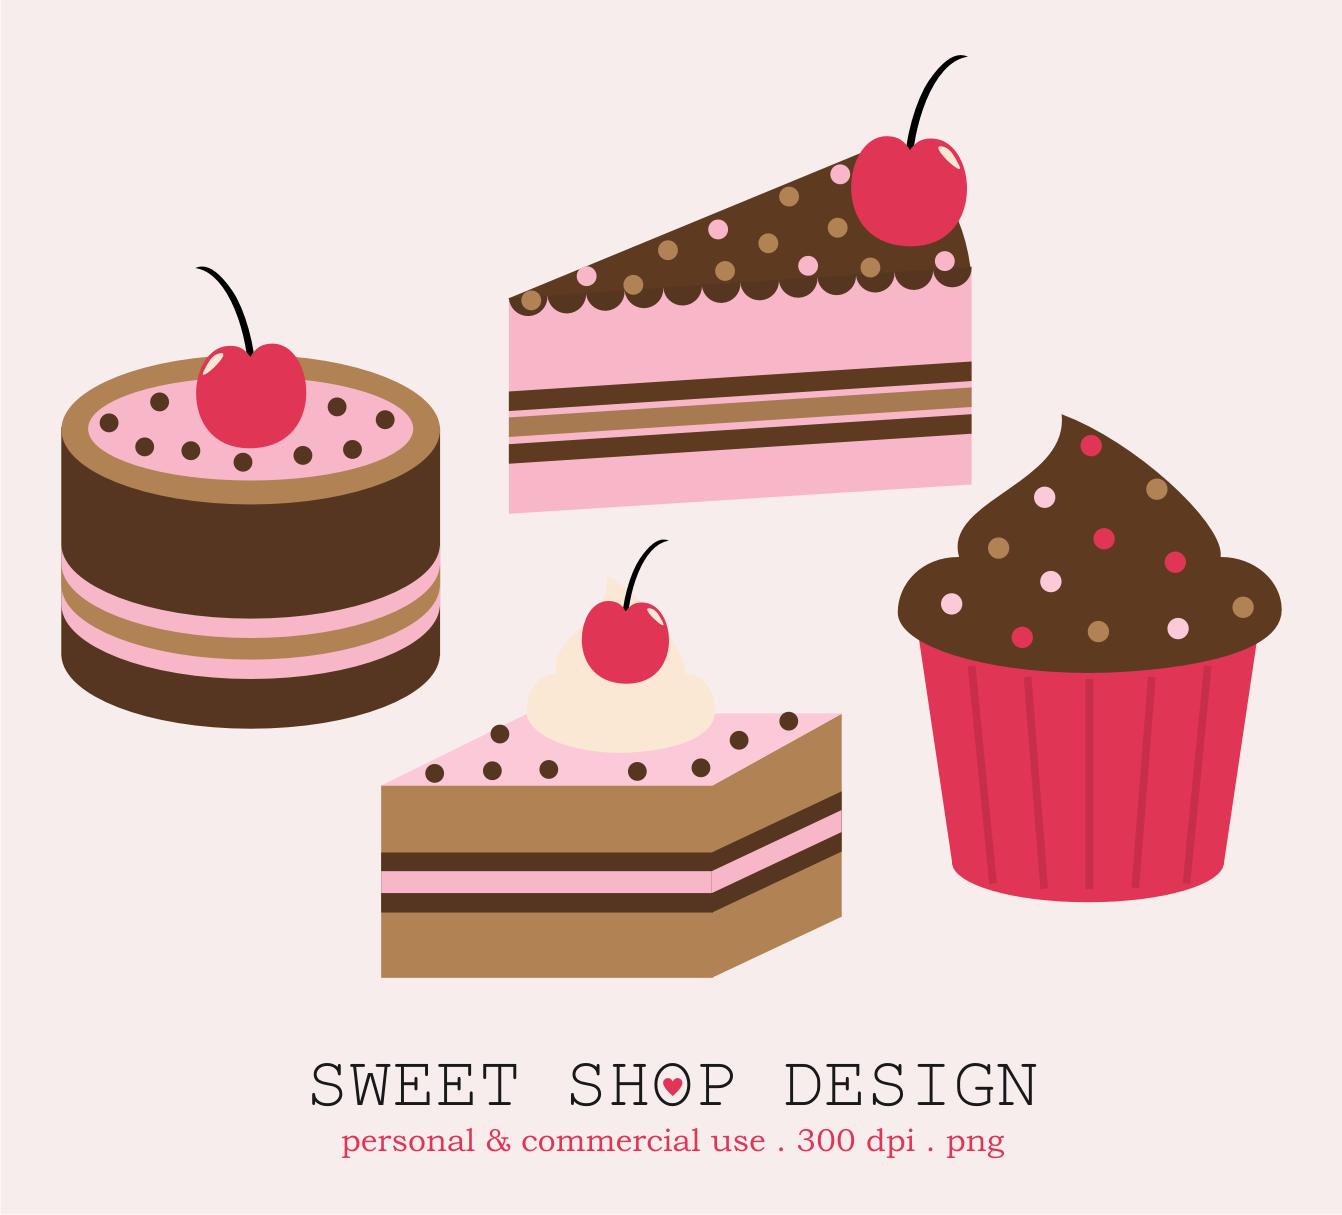 Sweet Shop Design: Cakes Clip Art Freebies